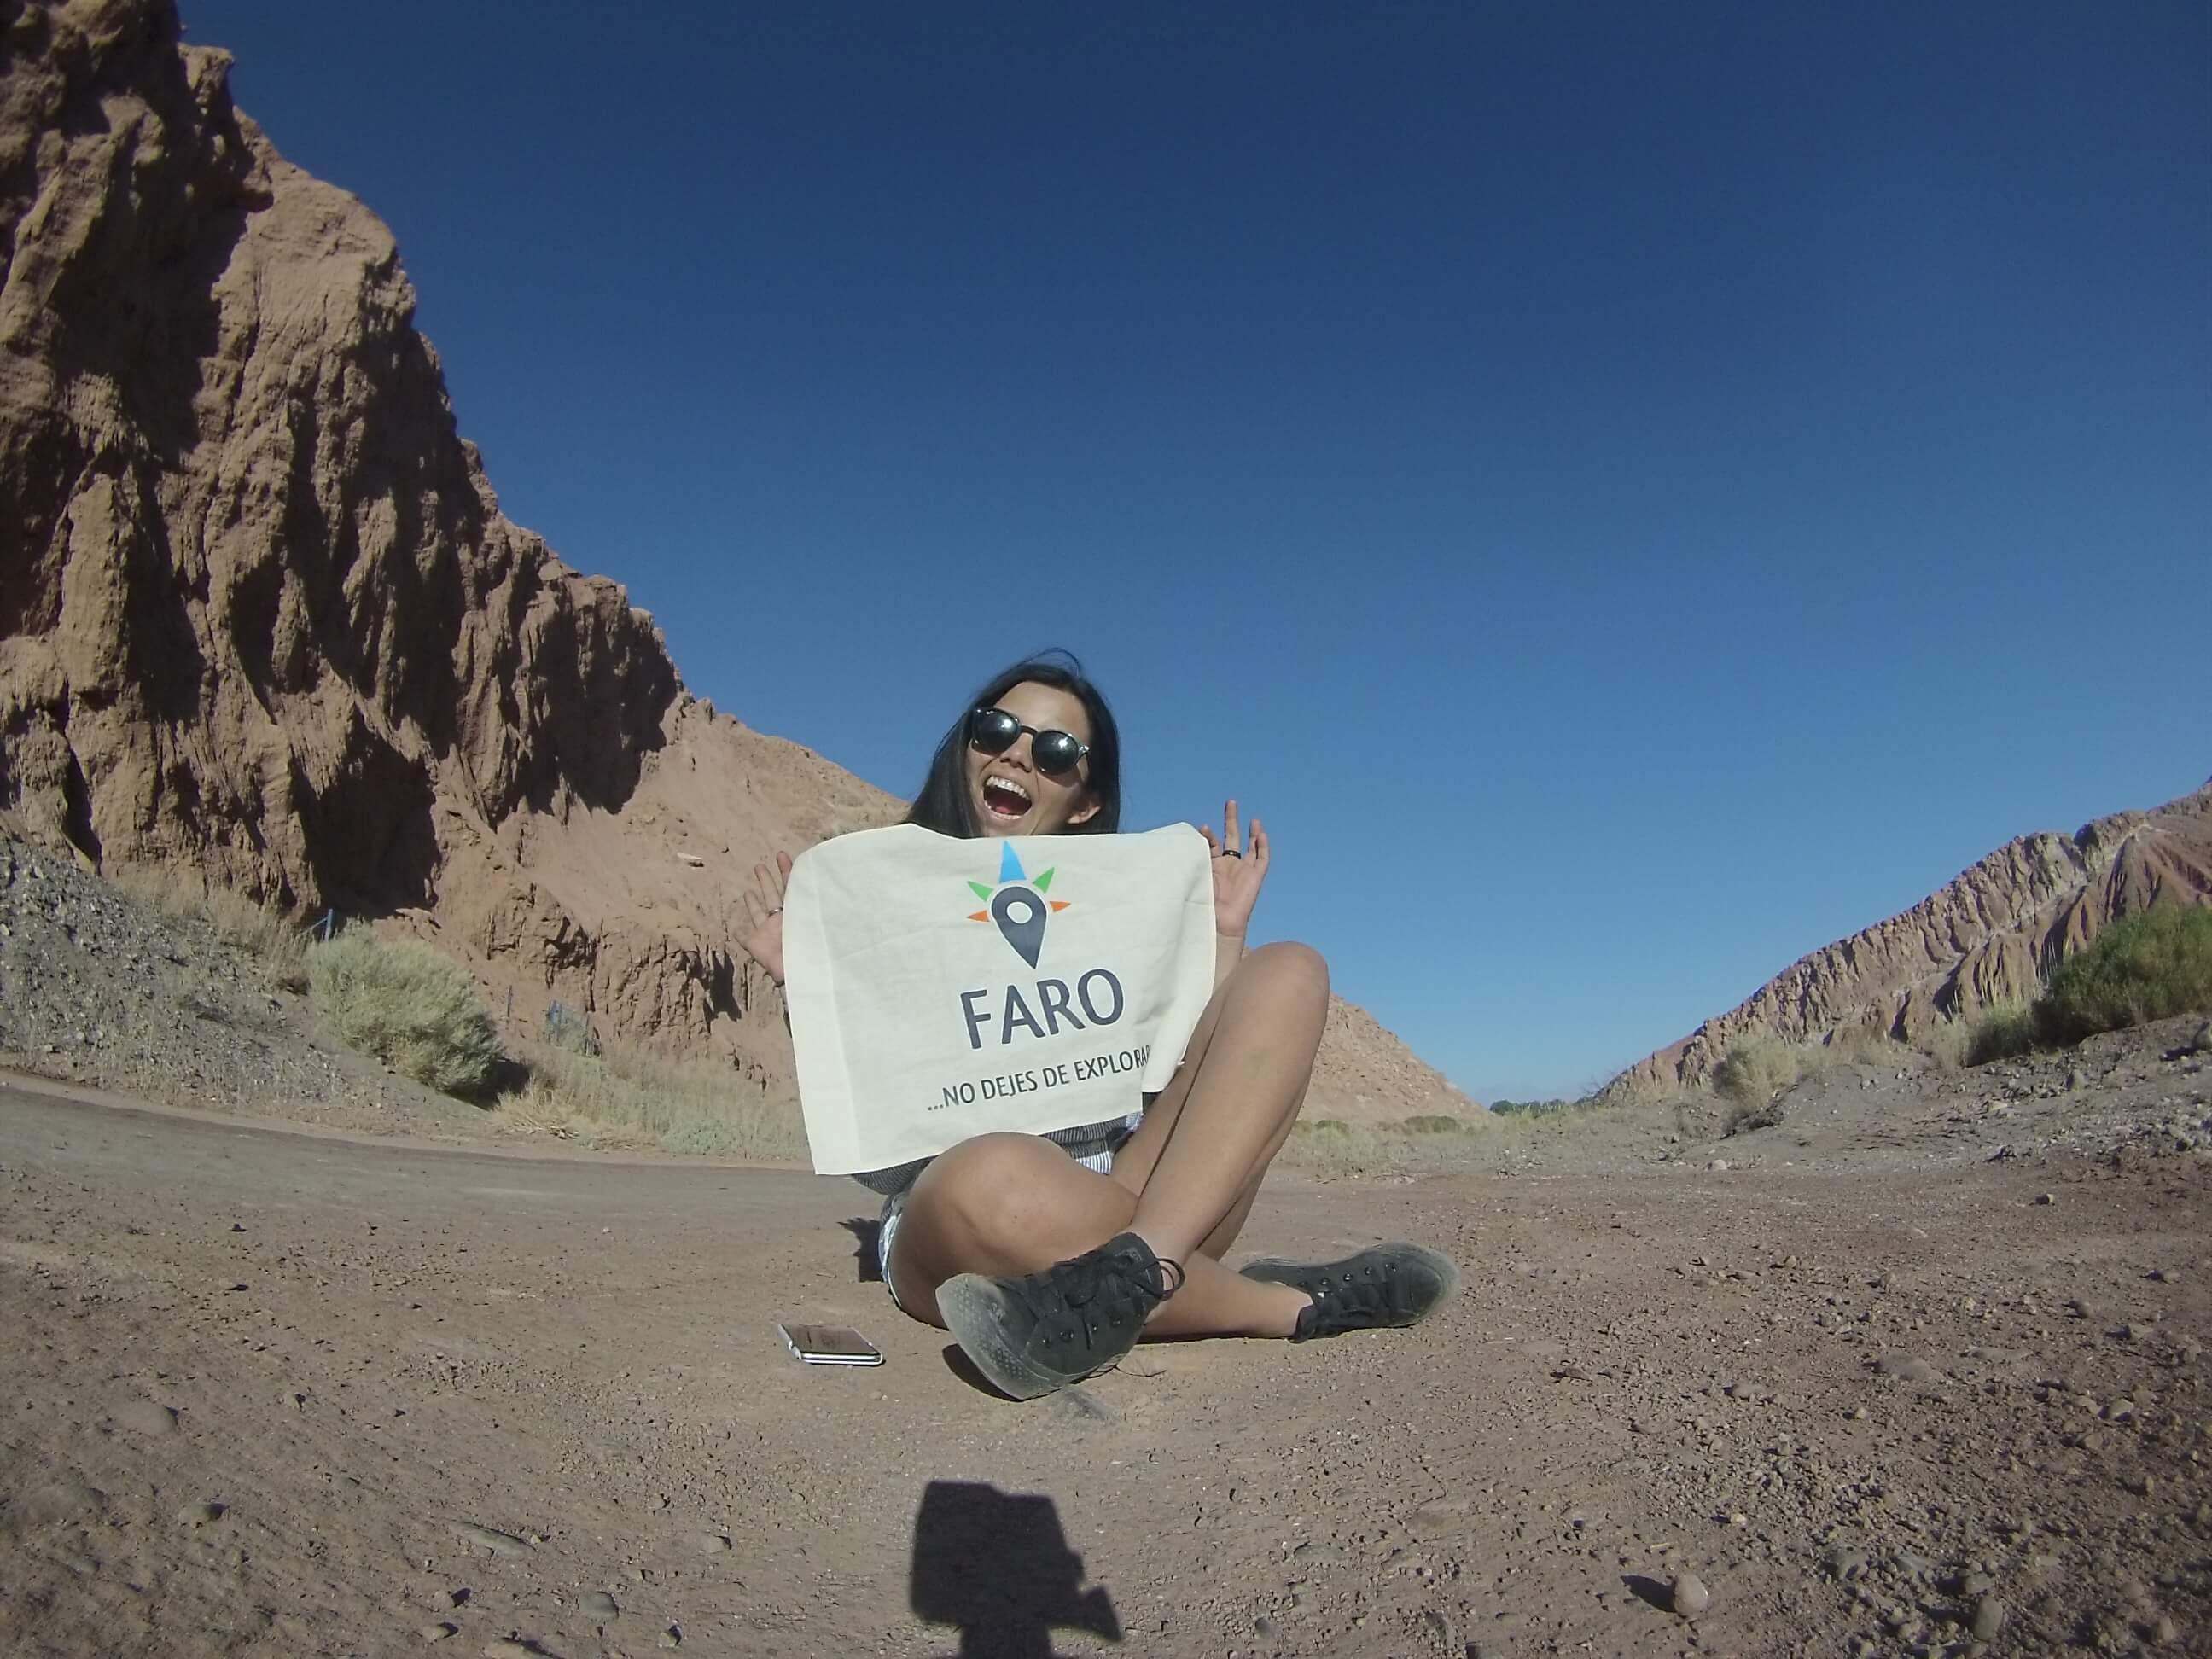 Renovando energías en San Pedro de Atacama